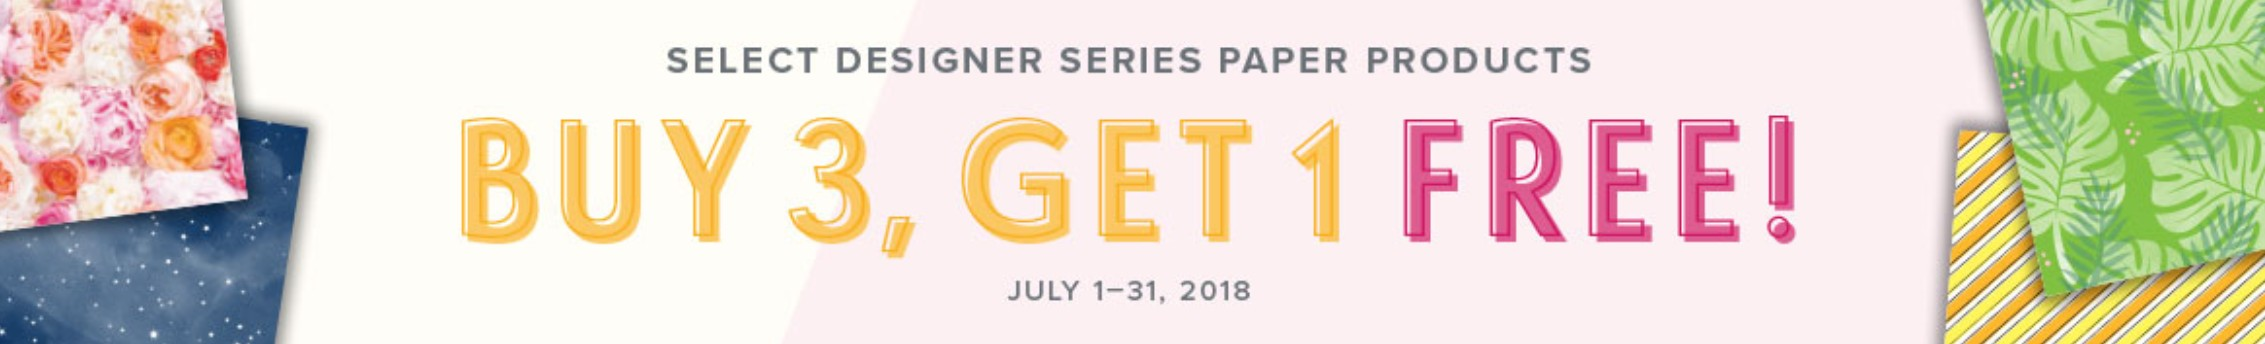 Designer Series Paper Buy 3, Get 1 Free